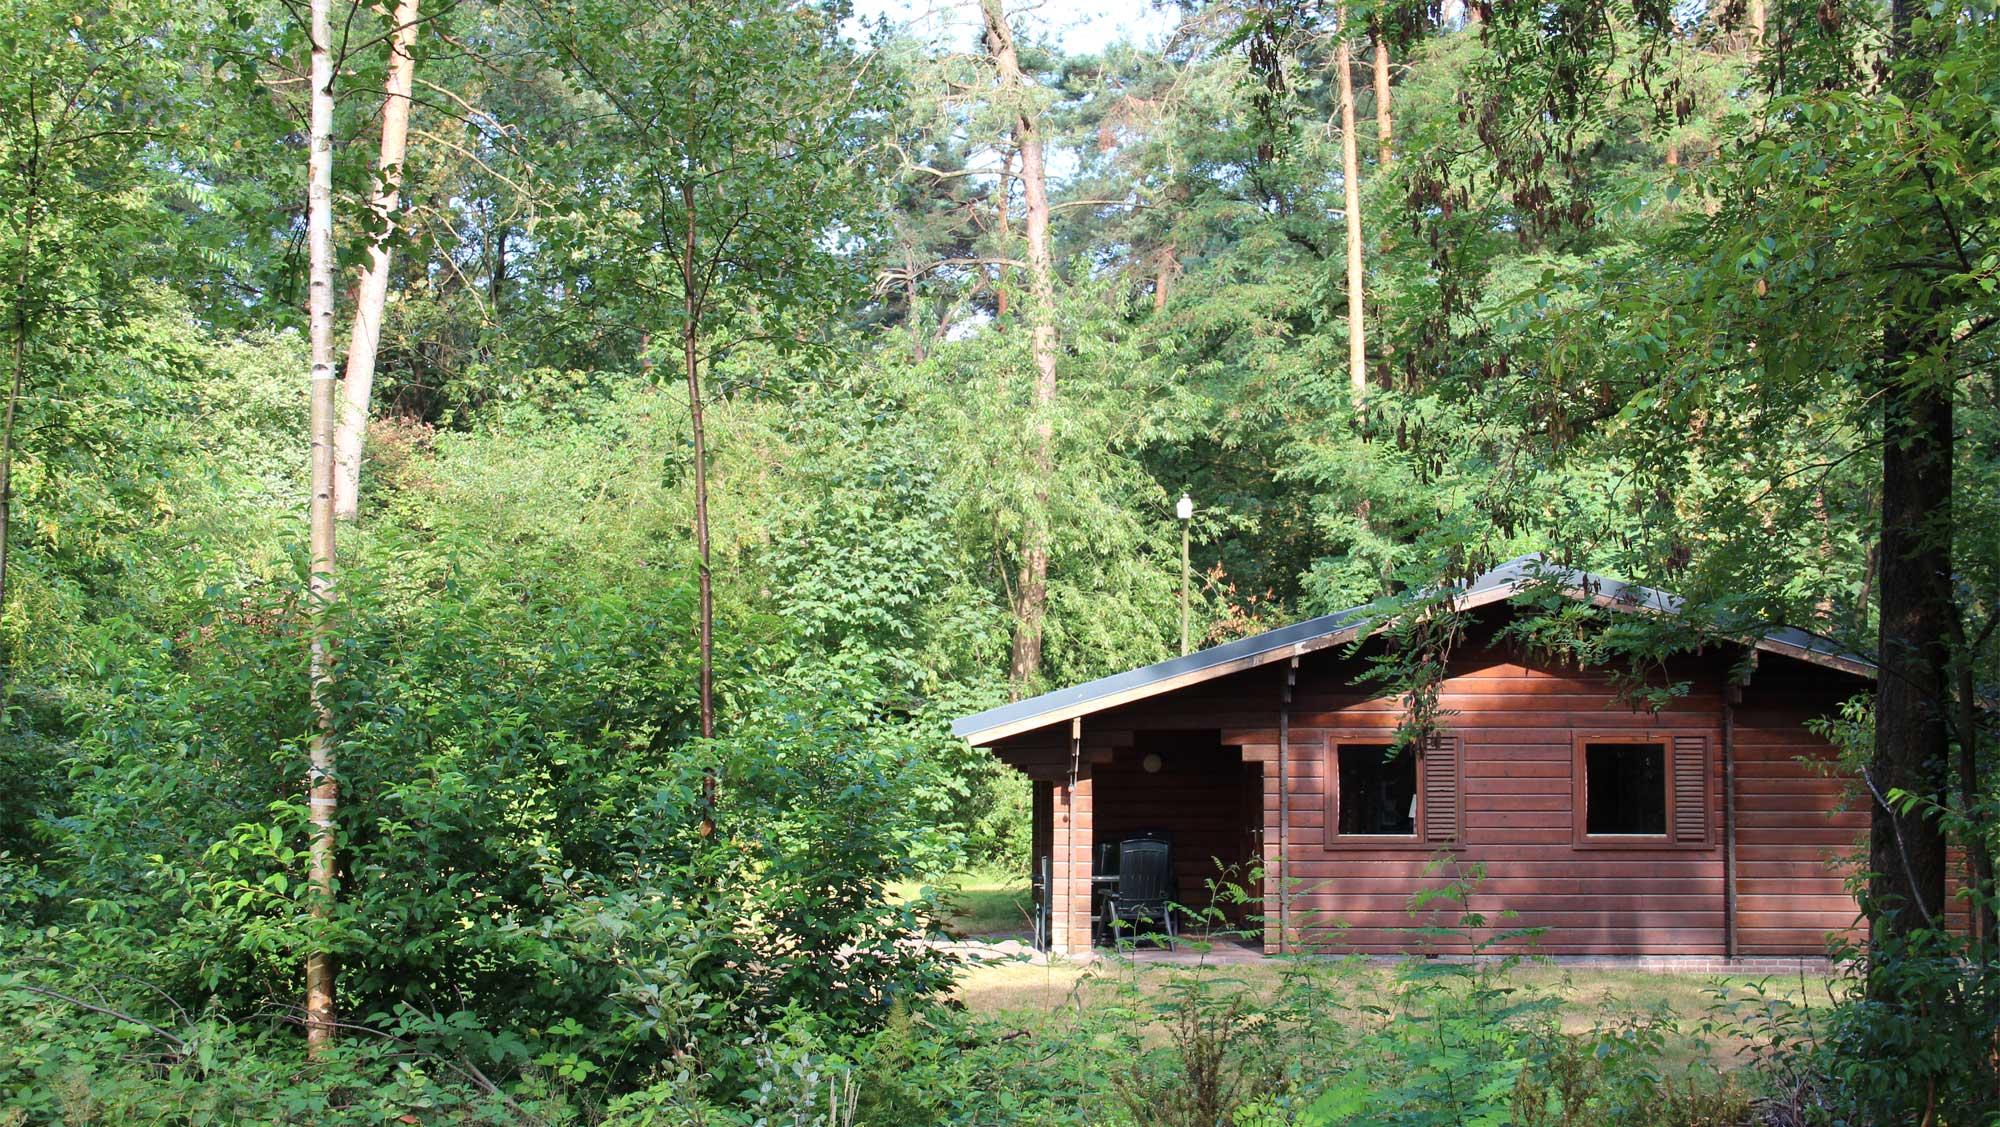 4pers bungalow Finse Molecaten Park Landgoed Ginkelduin 03